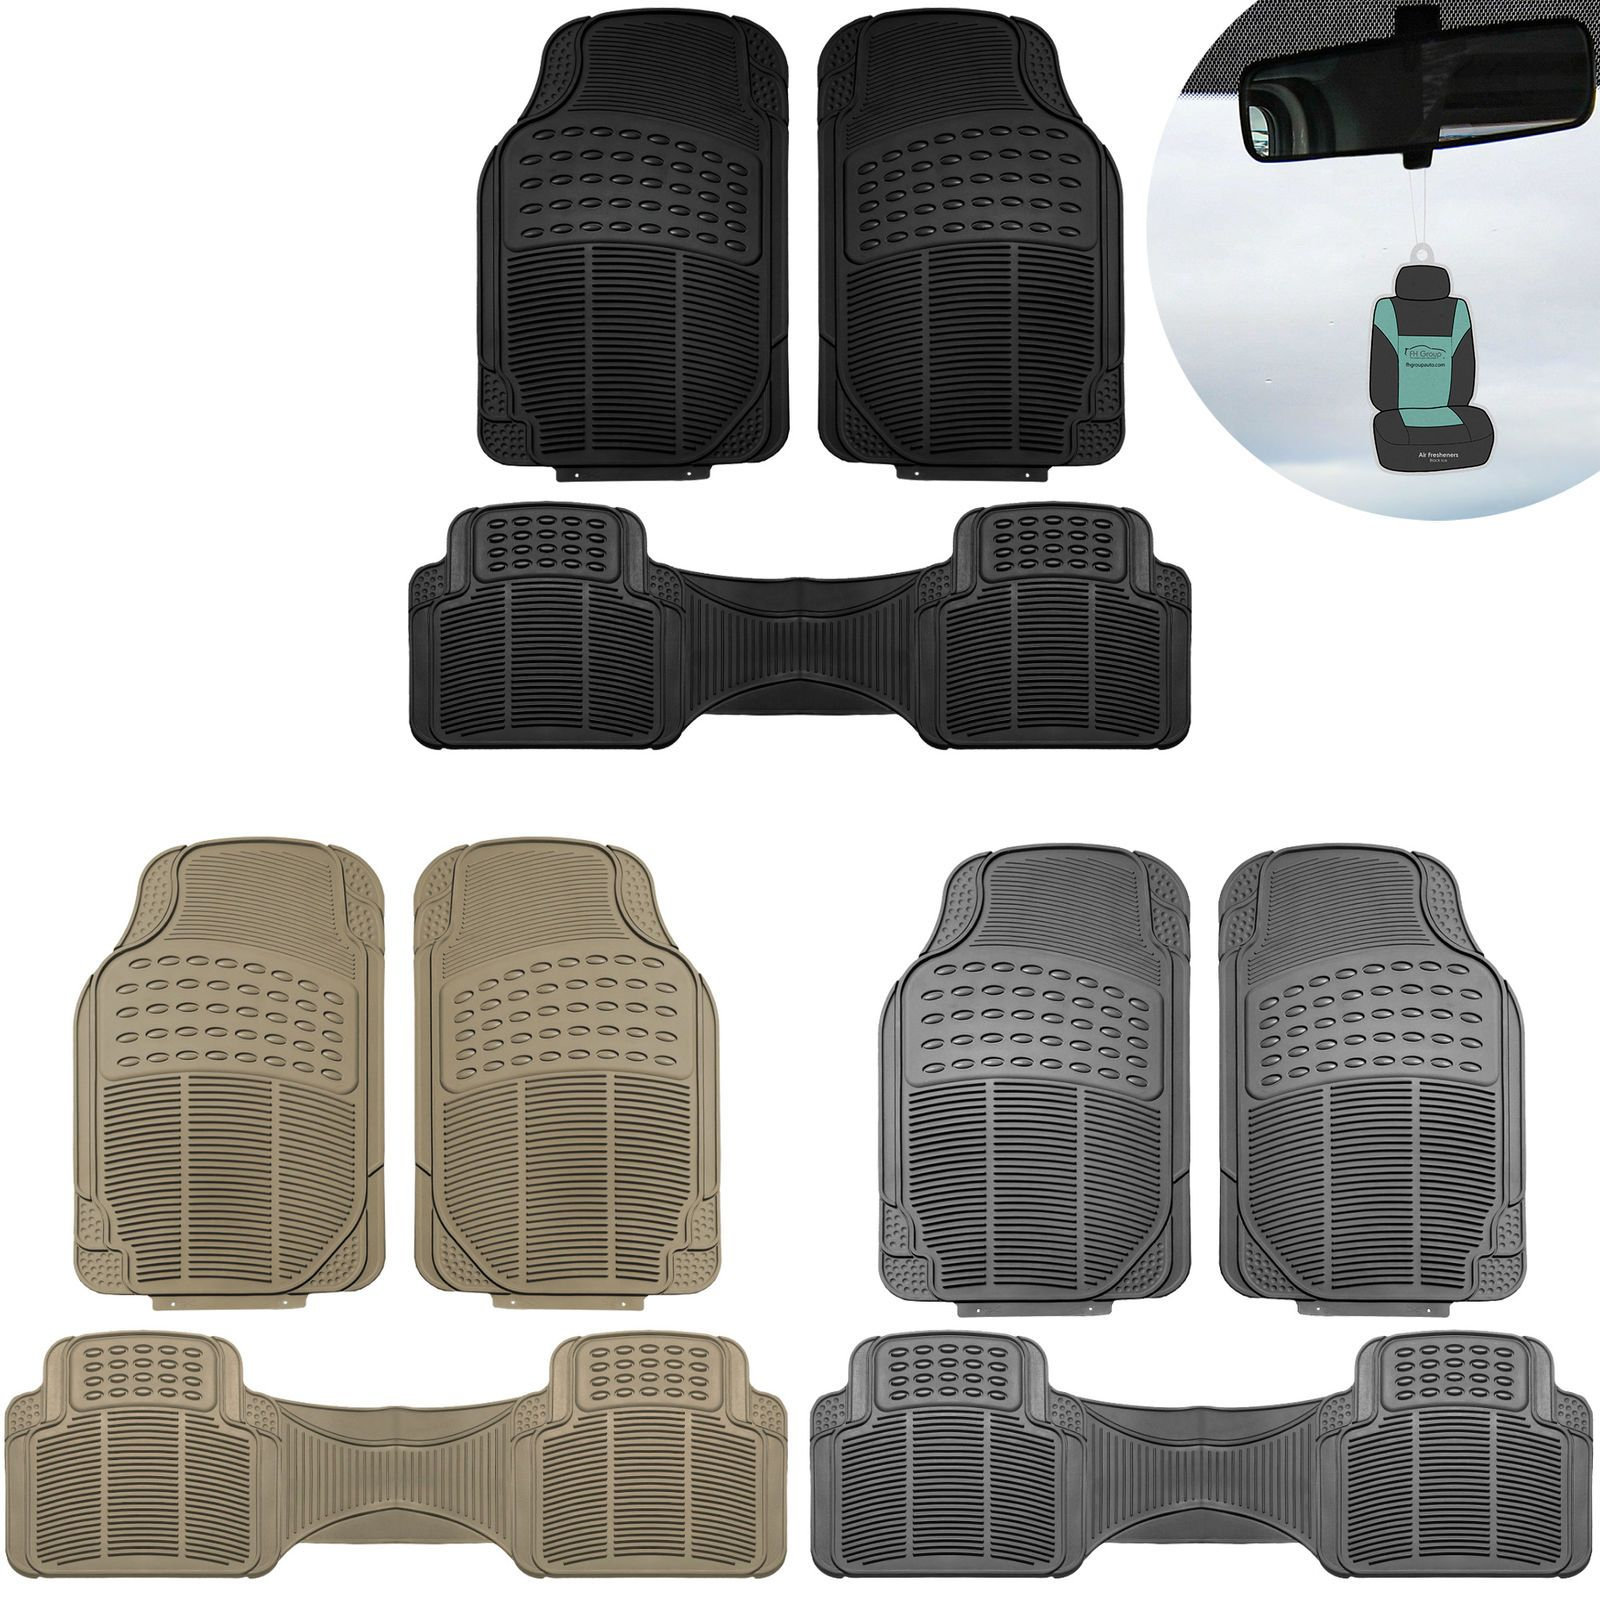 Details about 3pc Floor Mats for Auto Car SUV Van Heavy